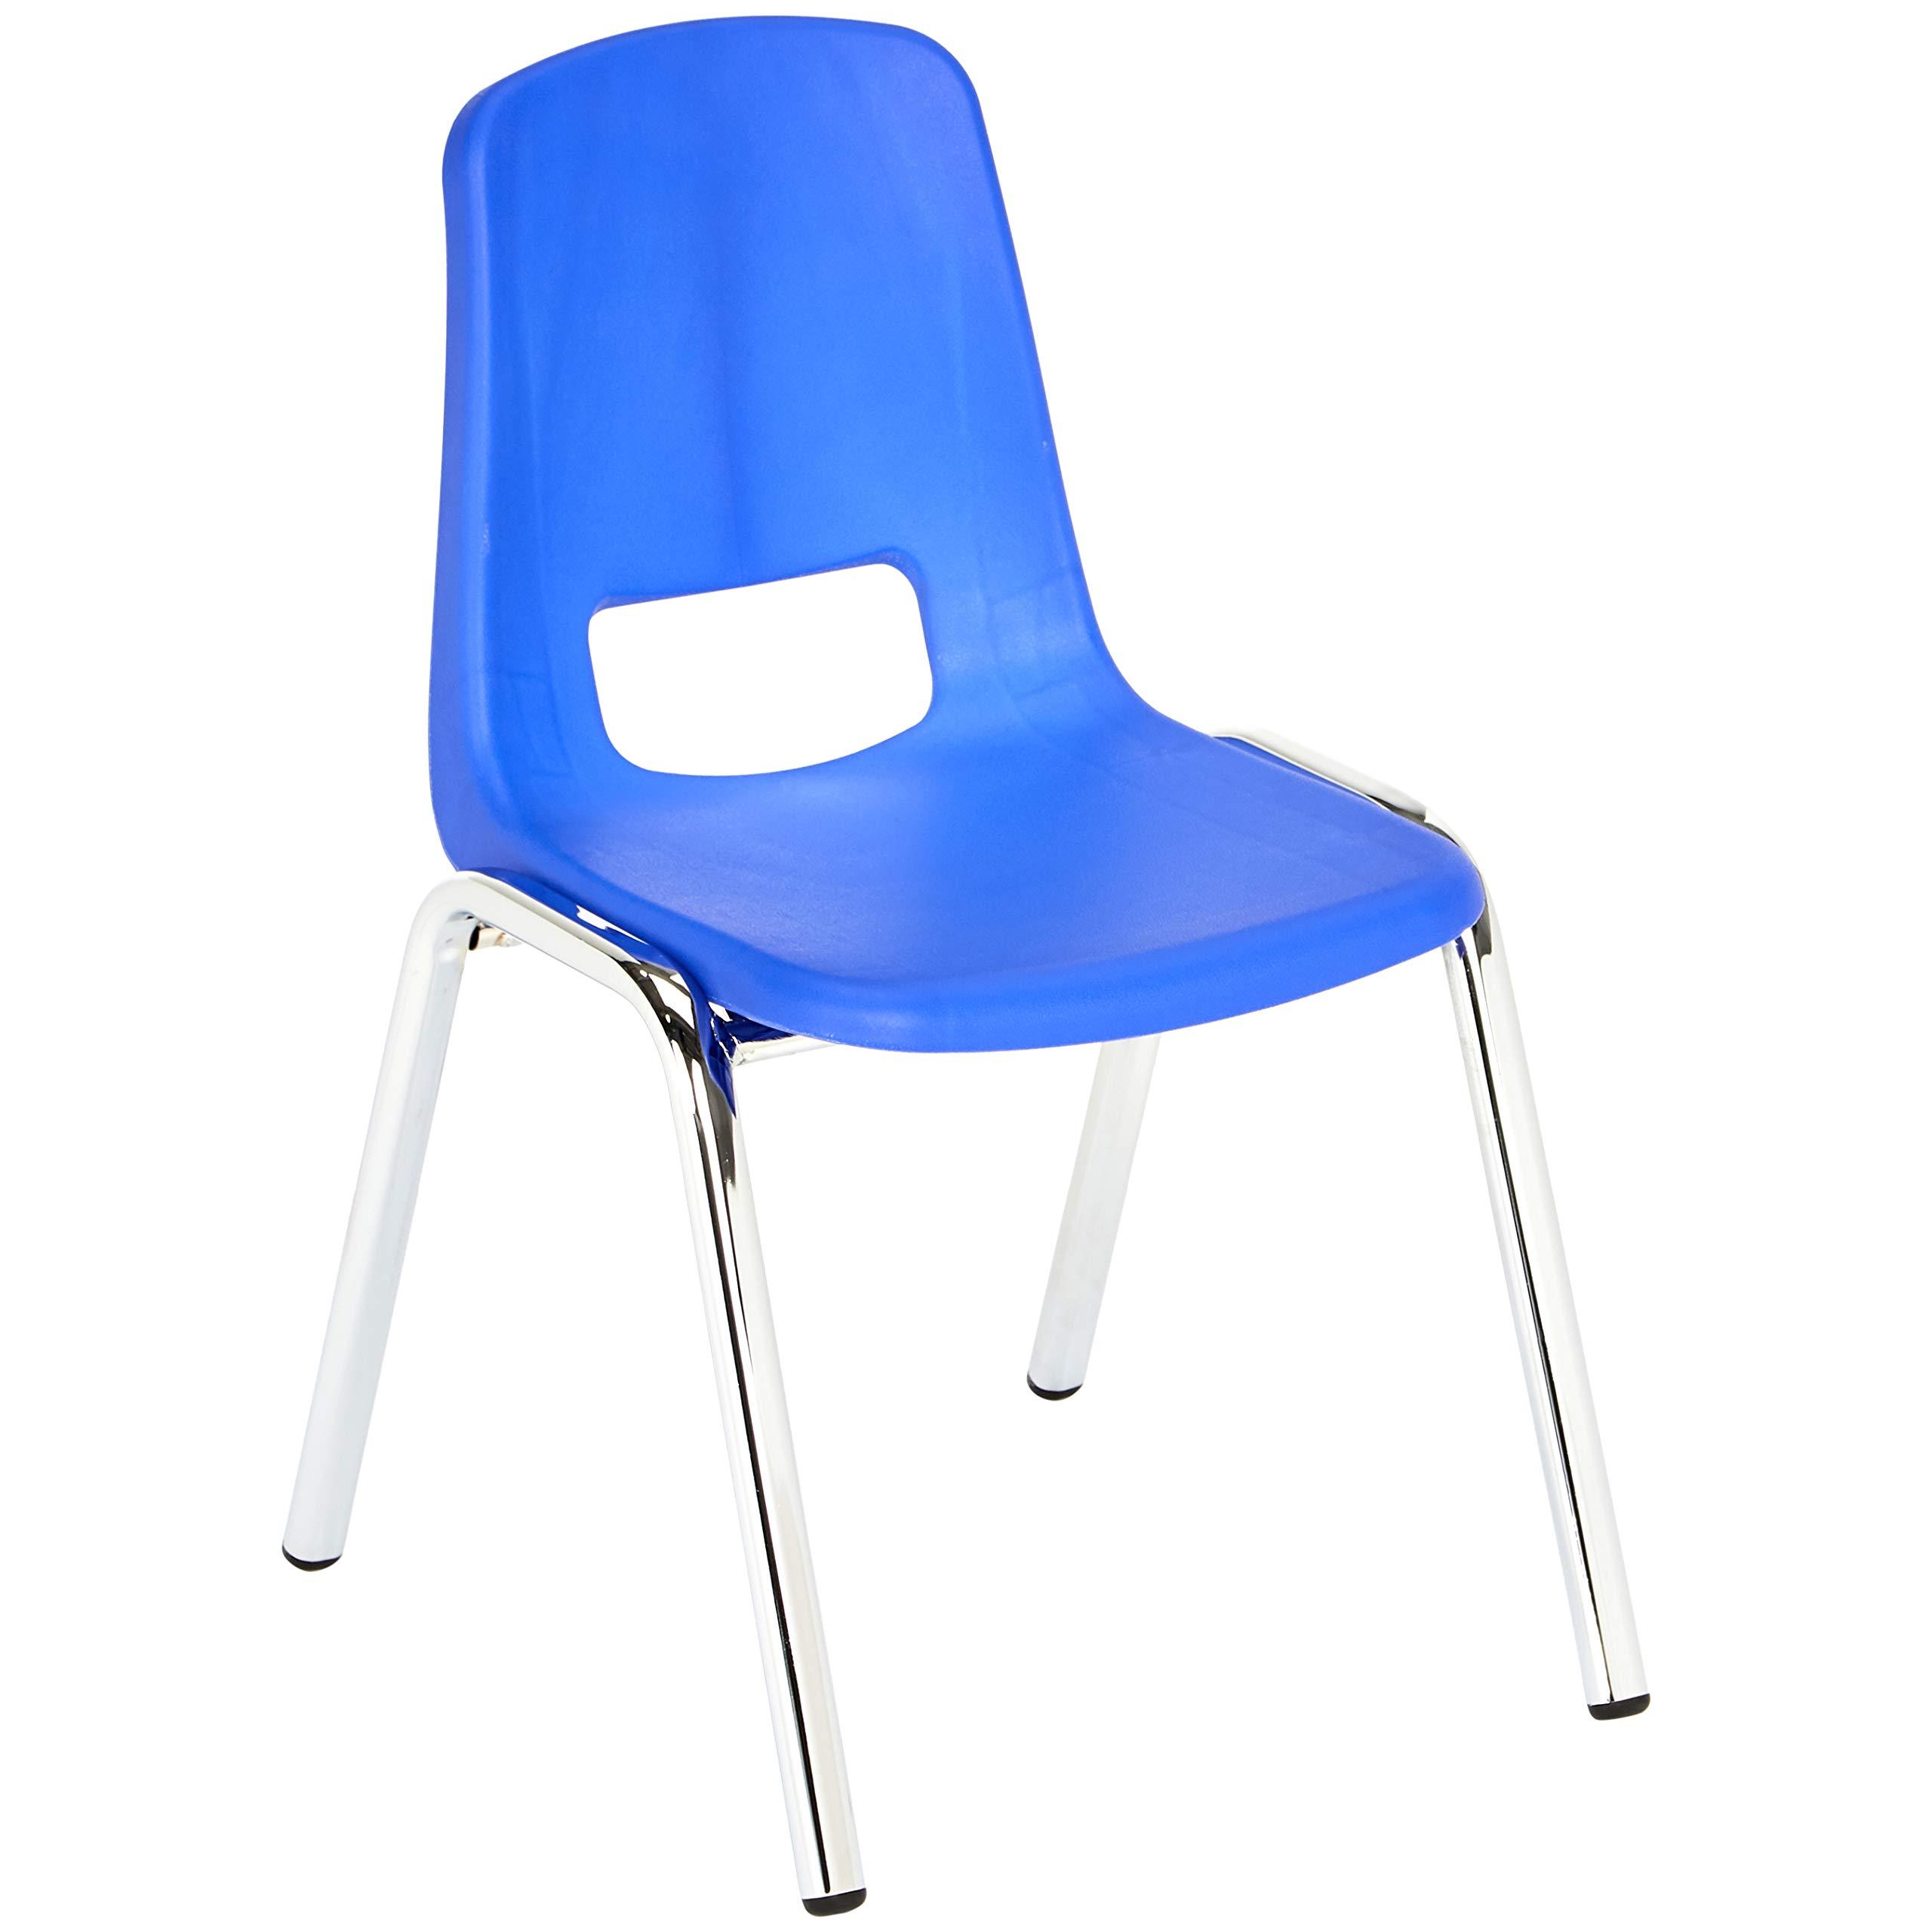 AmazonBasics 12 Inch School Stackable Chair - Chrome Legs, Blue, 6-Pack by AmazonBasics